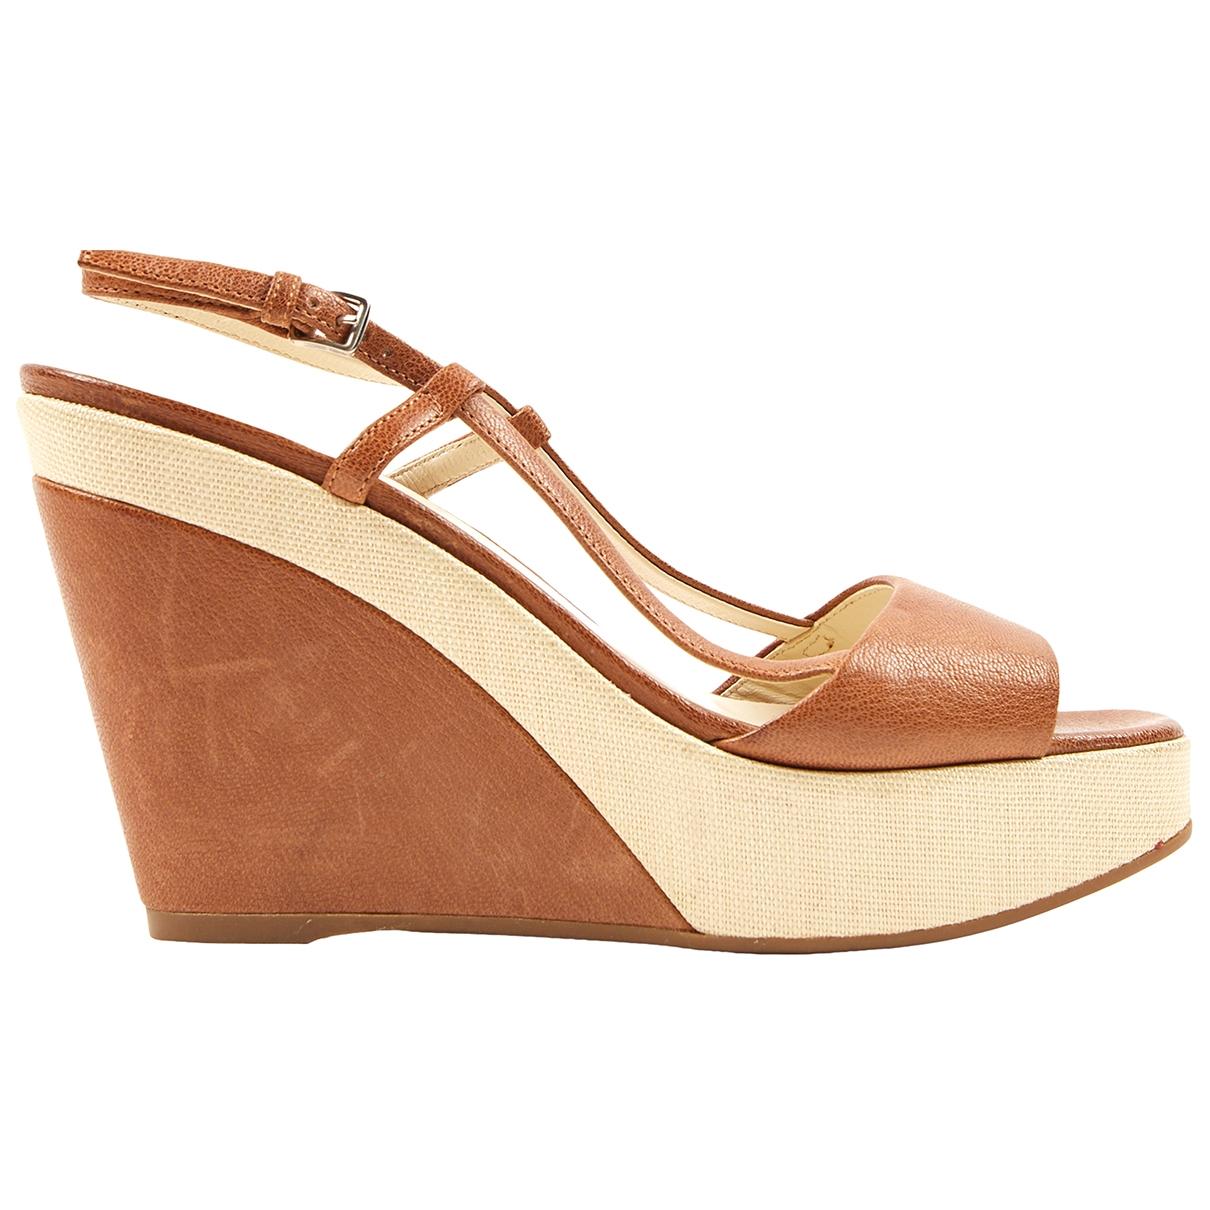 Jil Sander \N Brown Leather Sandals for Women 37.5 EU